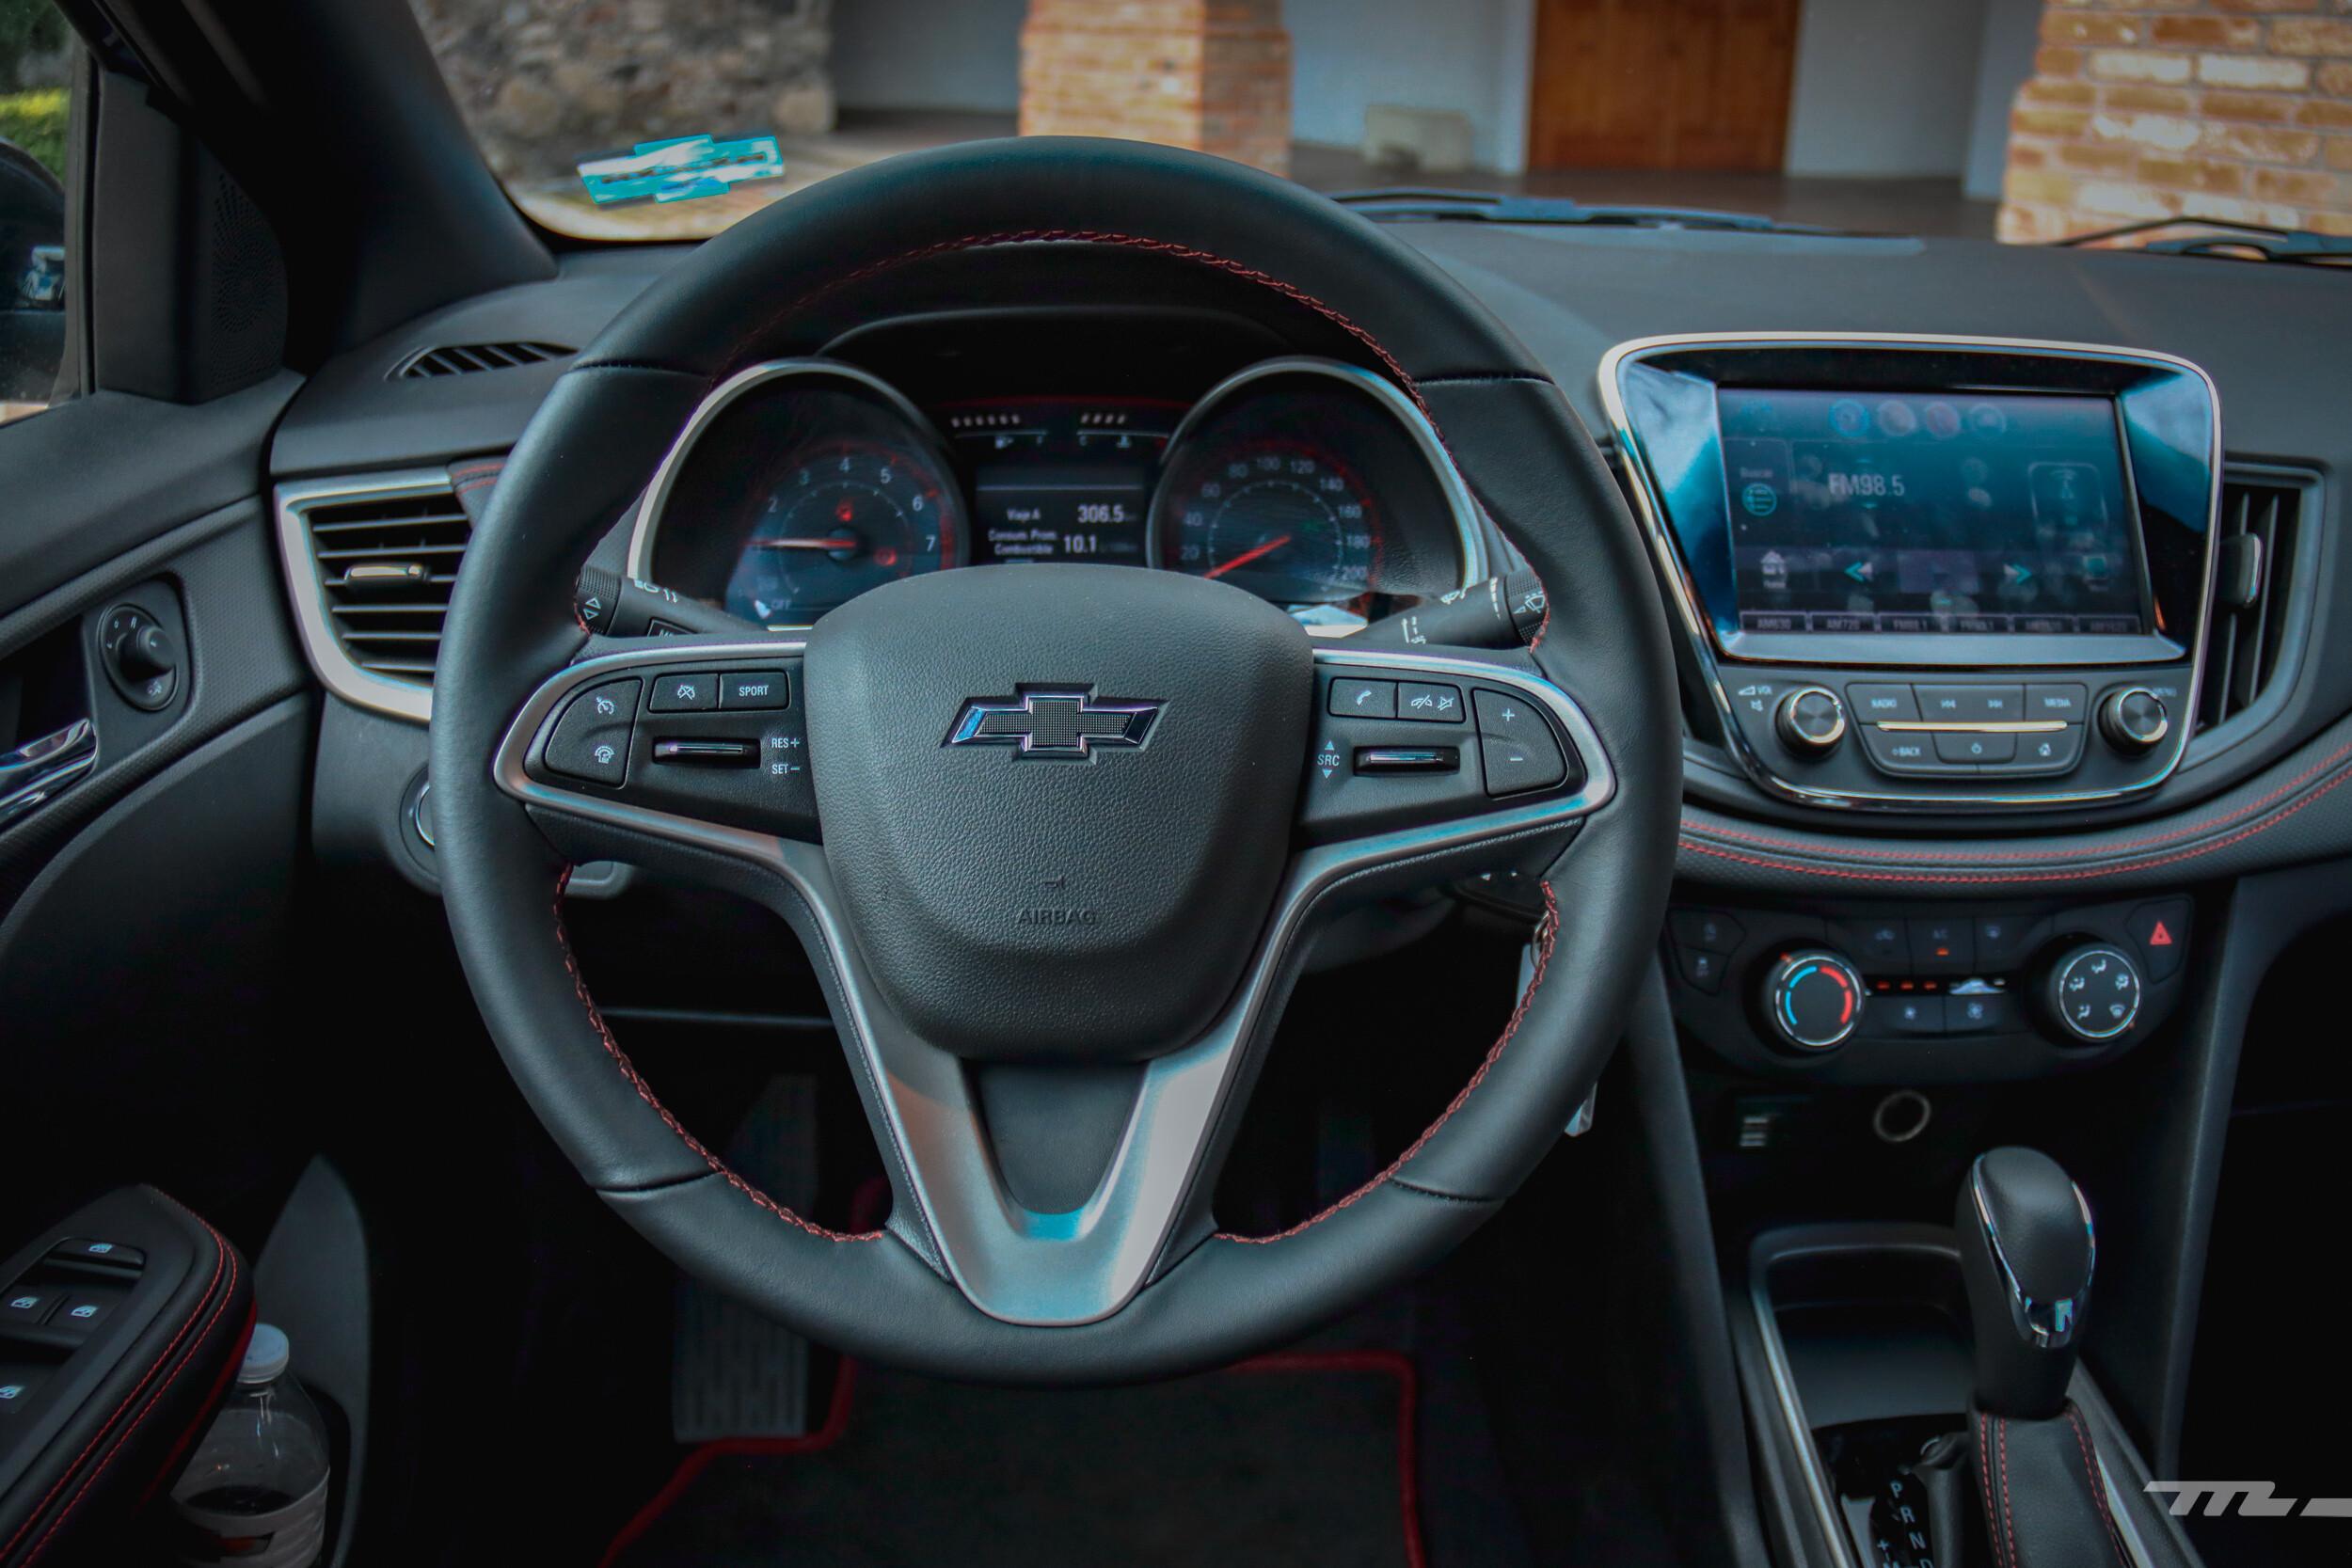 Foto de Chevrolet Cavalier Turbo 2022: Primer vistazo (28/37)